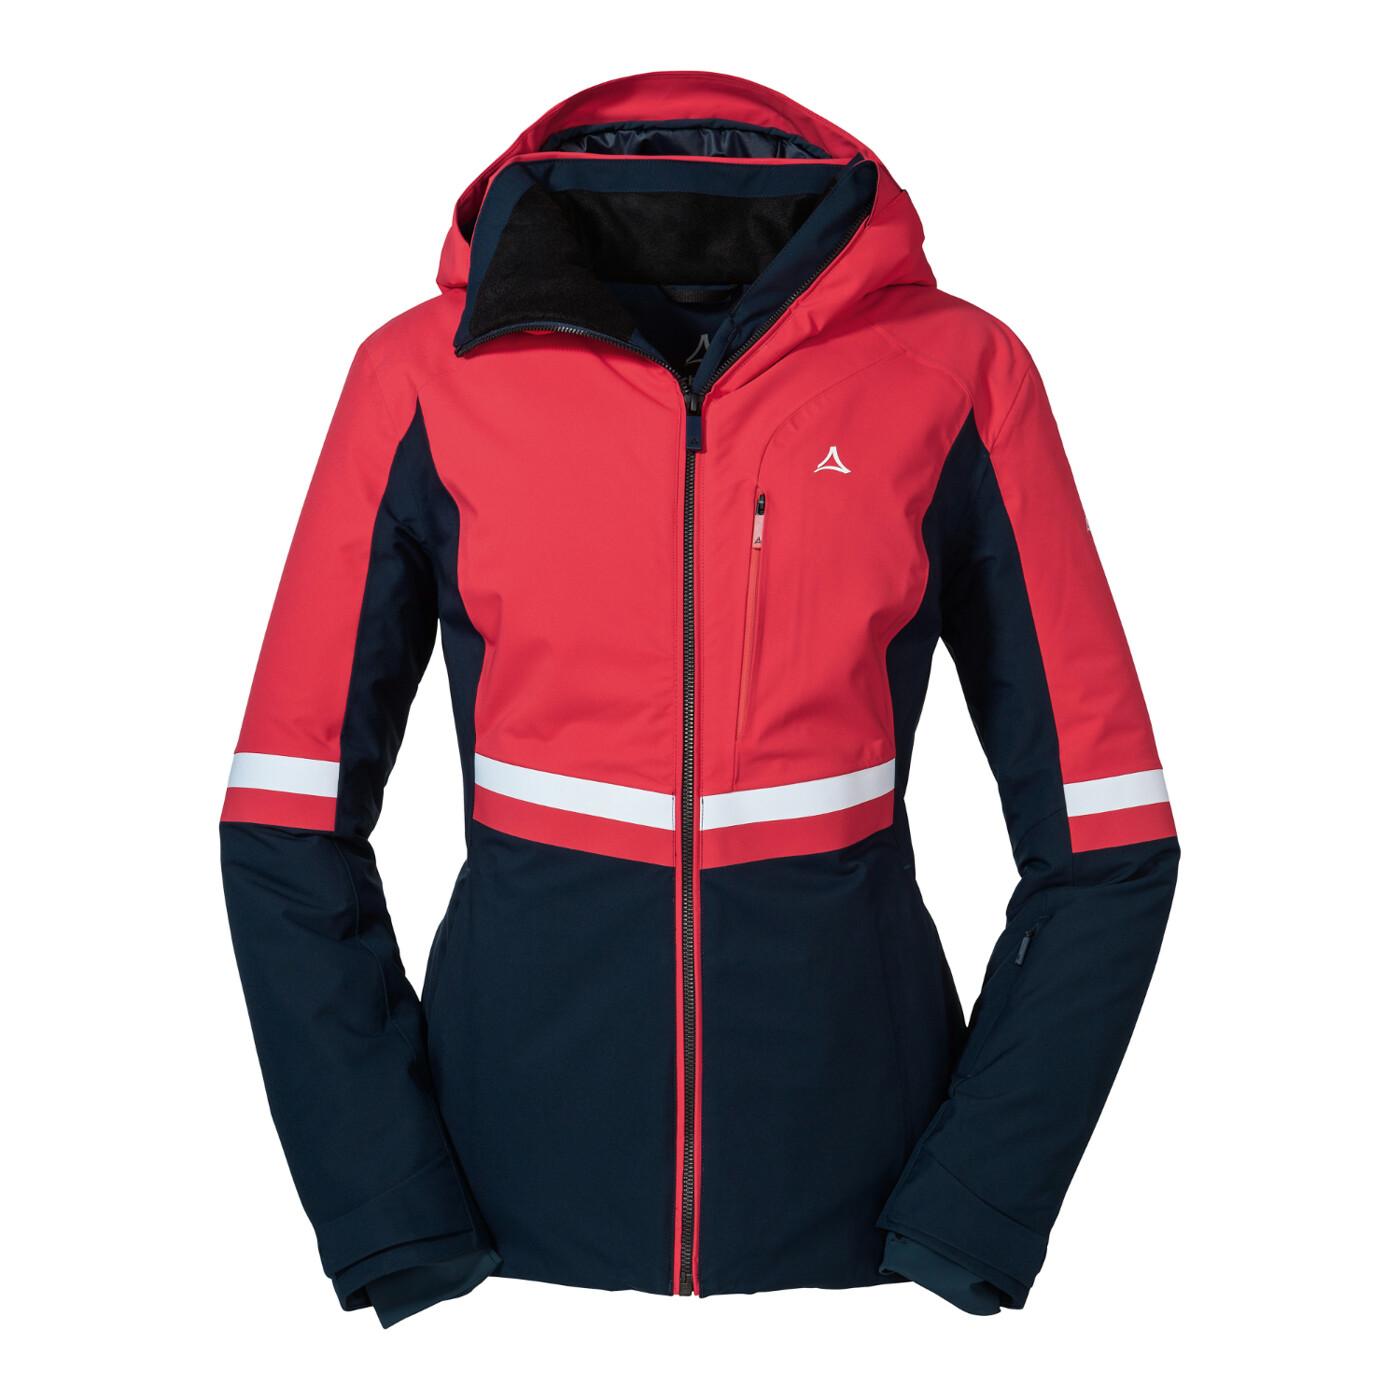 SCHÖFFEL Ski Jacket Carmenna L - Damen